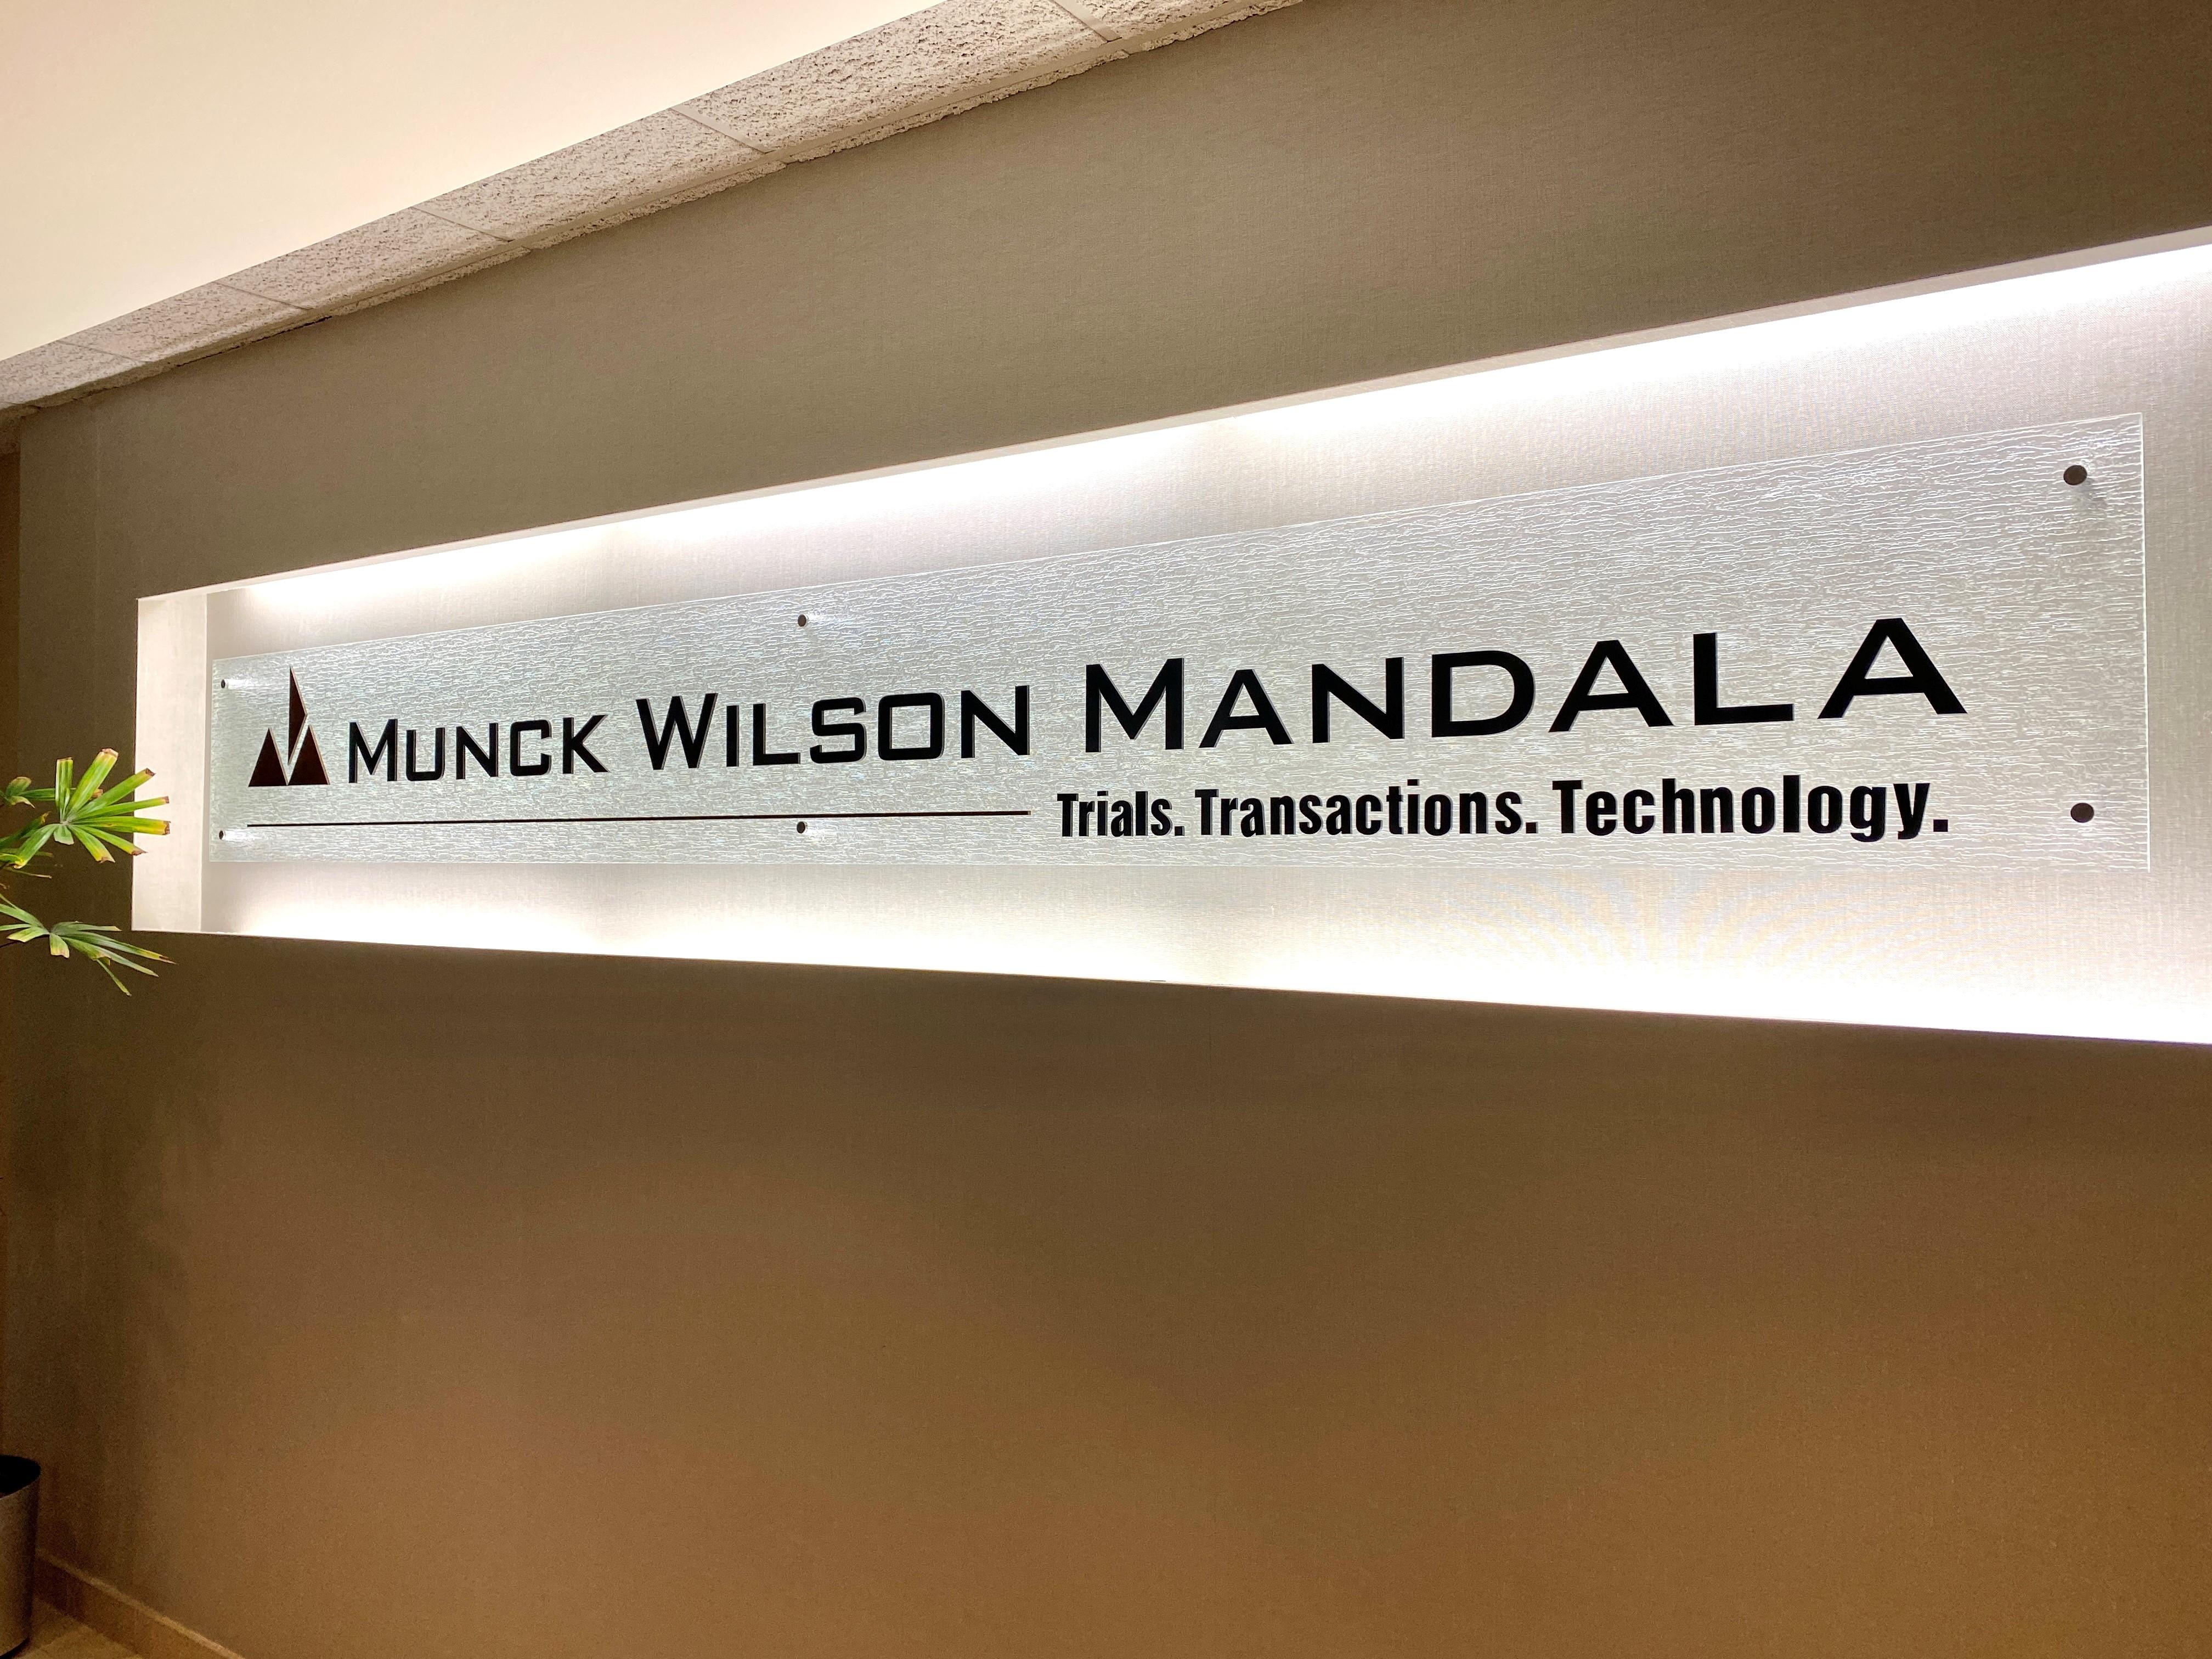 Munck Wilson Mandala offices in Dallas. REUTERS/Chinekwu Osakwe